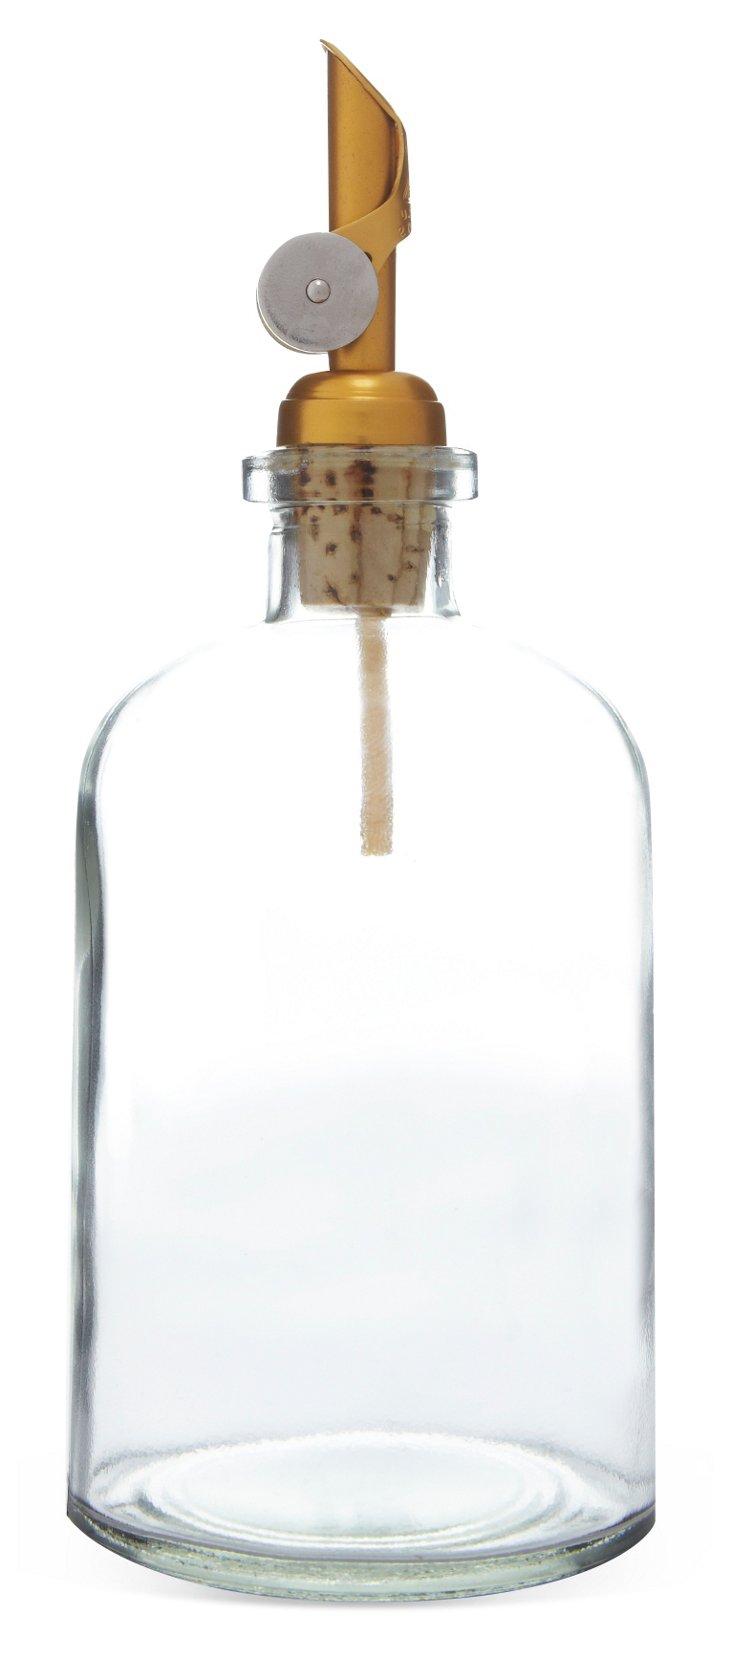 Weighted Tip Glass Dispenser, Gold